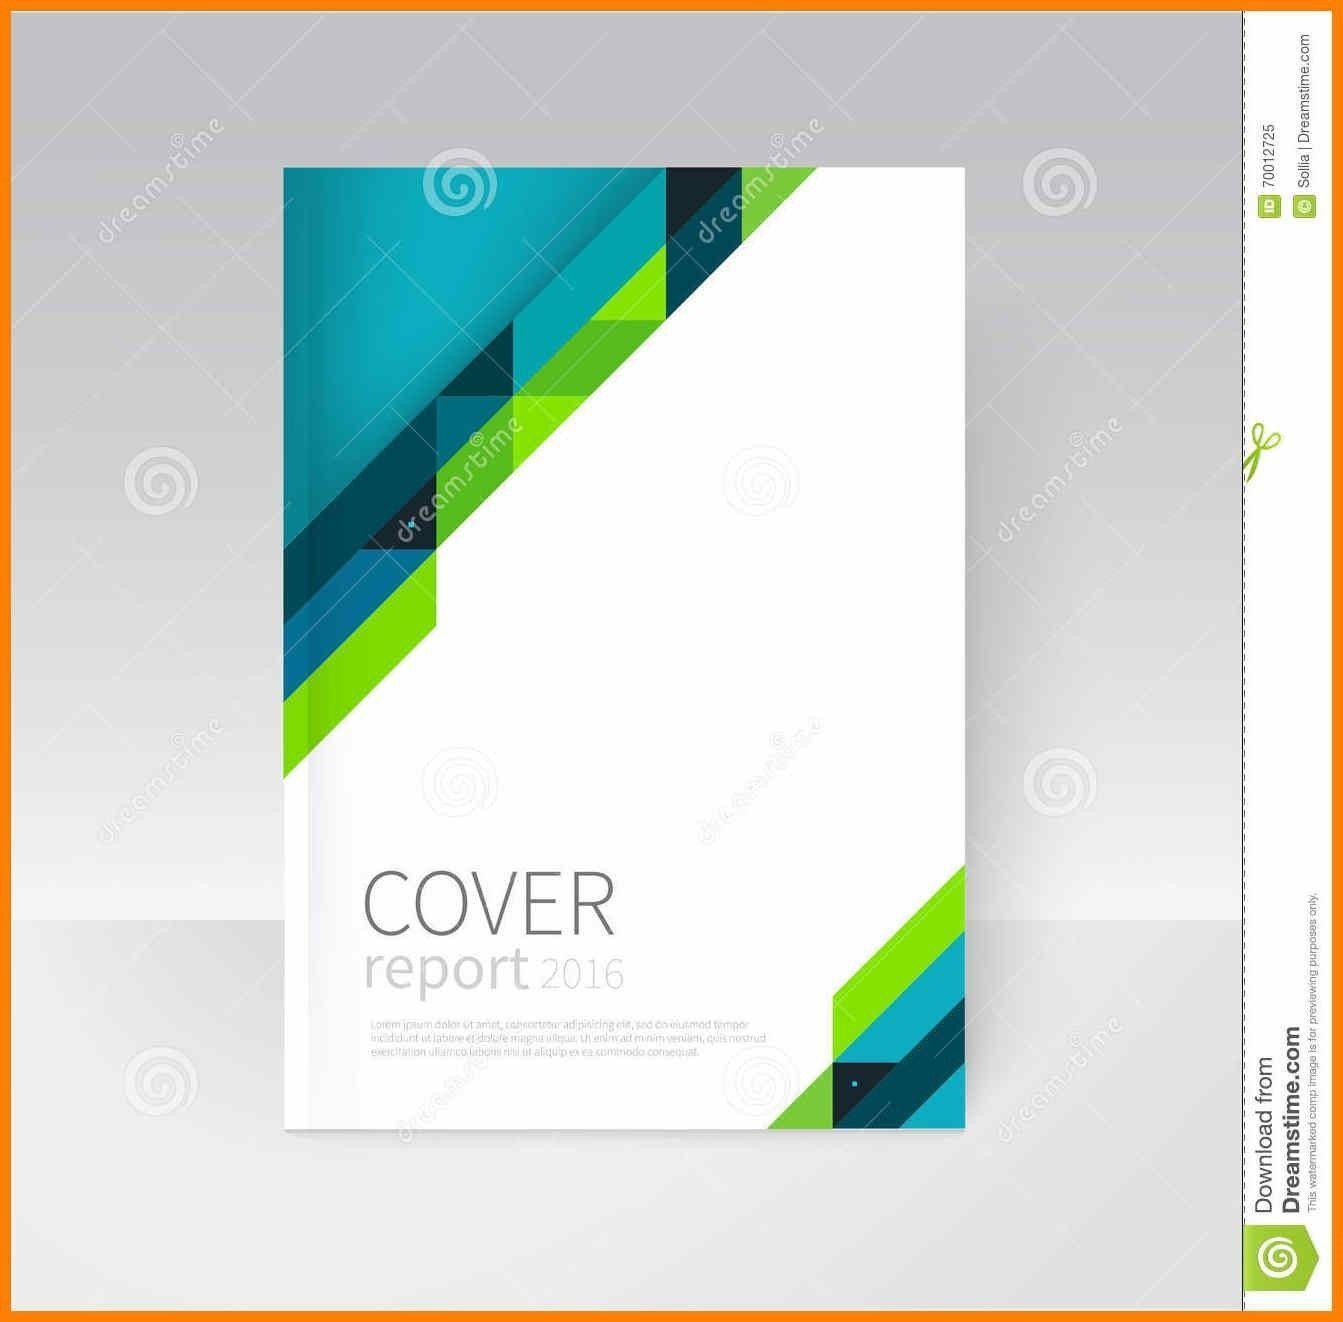 000 Dreaded M Word Template Free Download Concept  Microsoft Office Invoice Letterhead 2003 ResumeFull